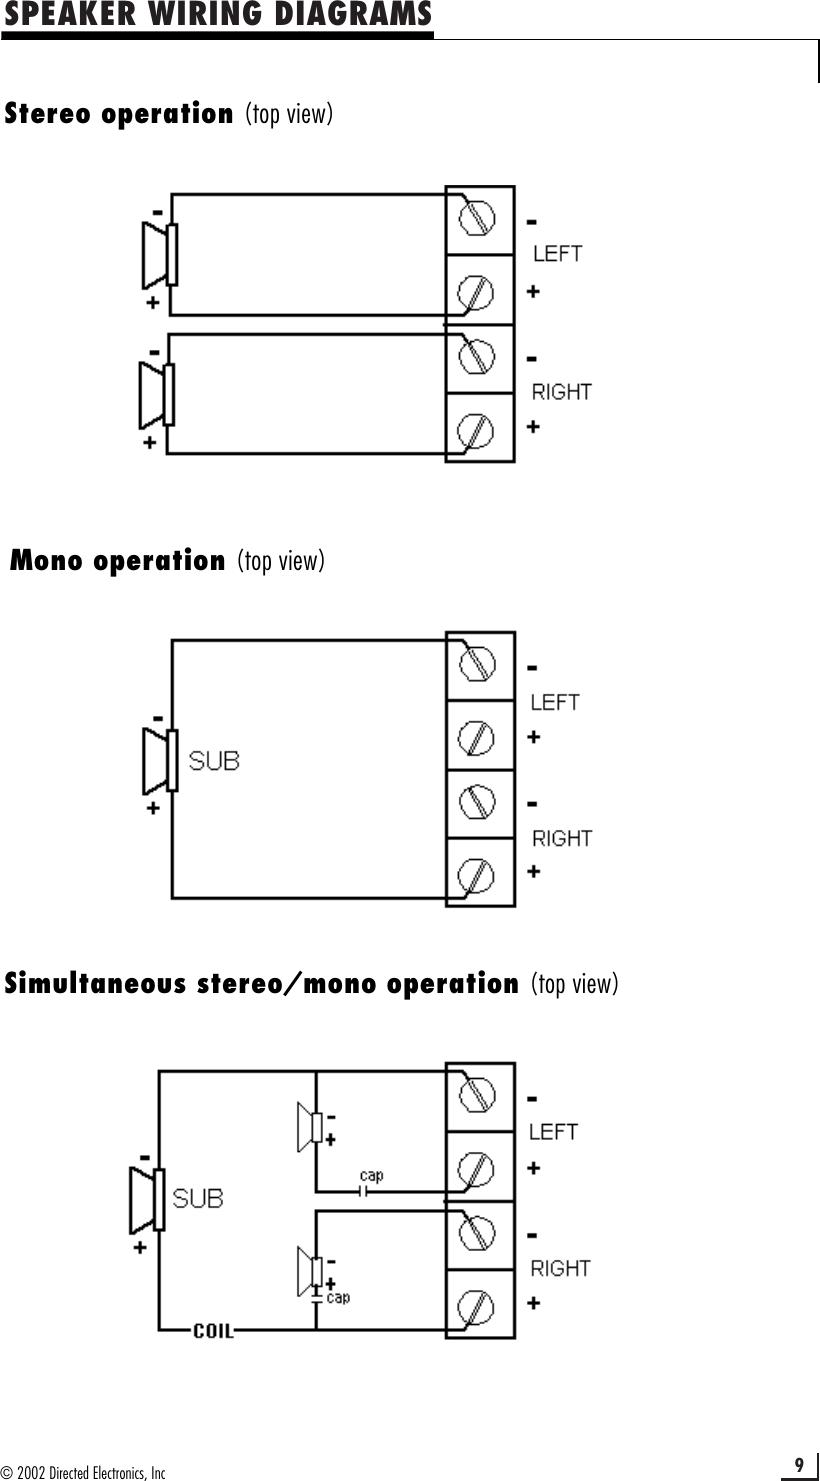 BT 2150 User Manual To The 94af939b 46c2 bbb4 ad76 f44840dc487c